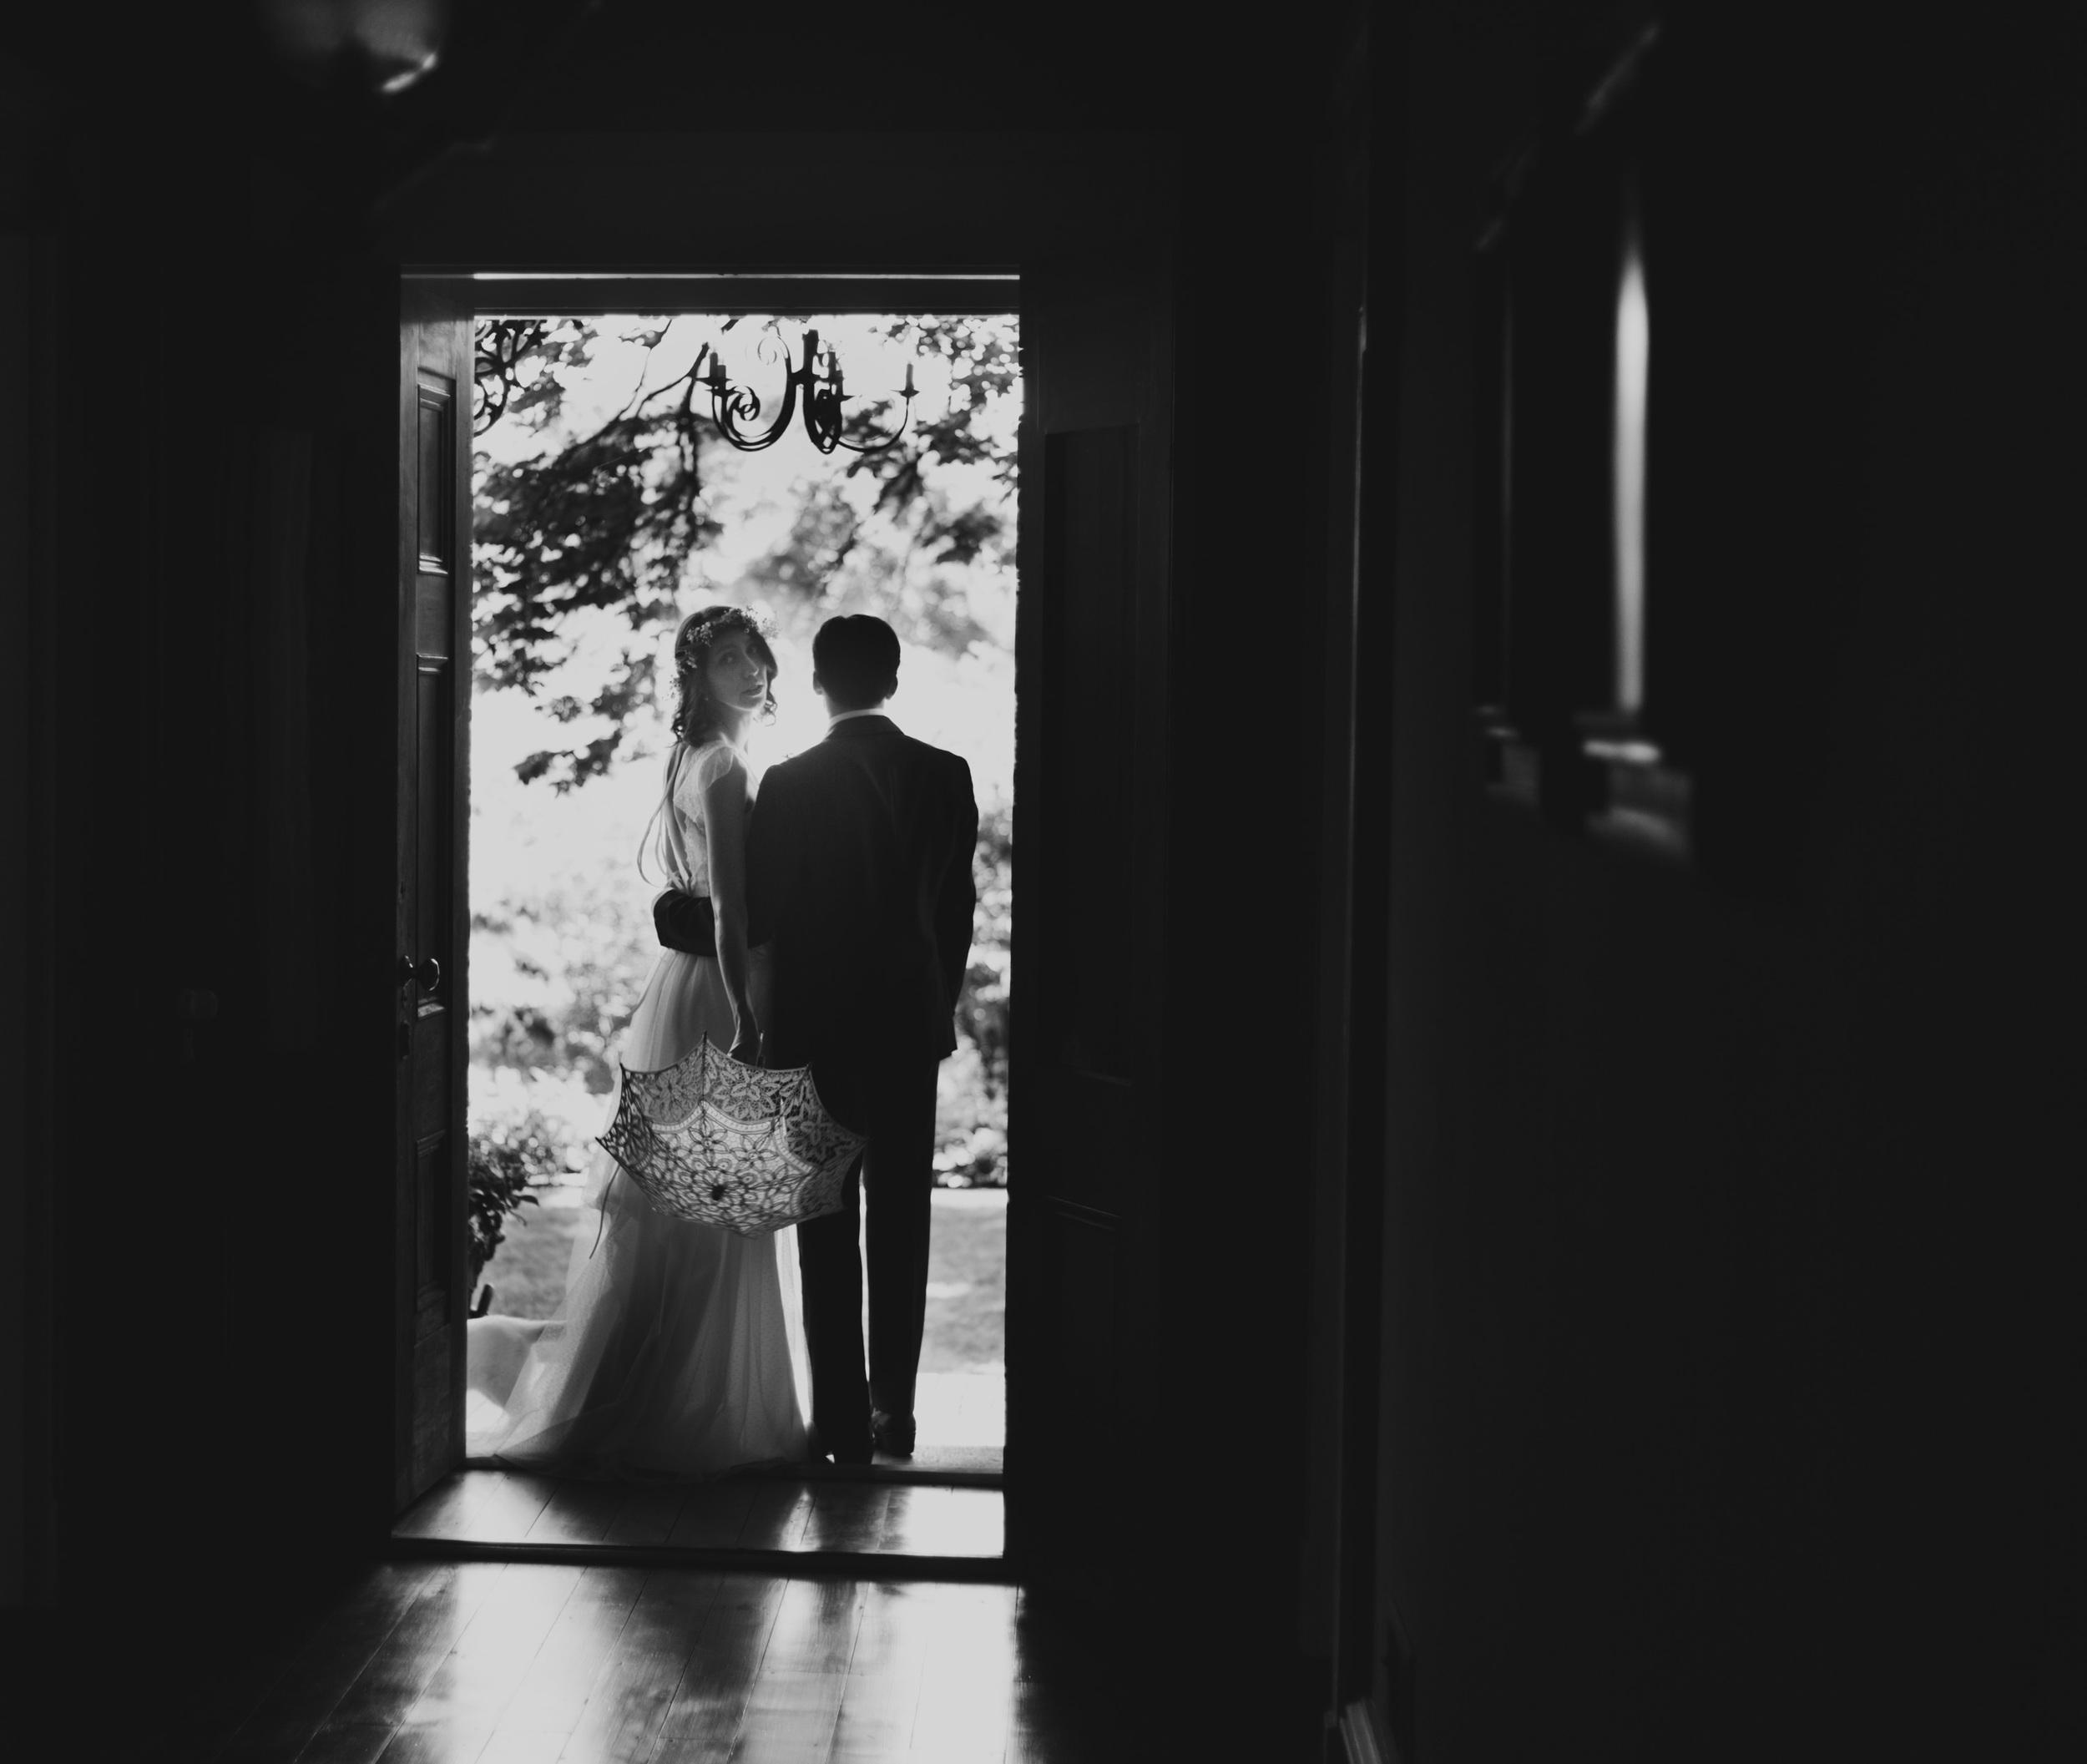 pennsylvaniapaweddingphotographersphotographyfilmblackandwhite